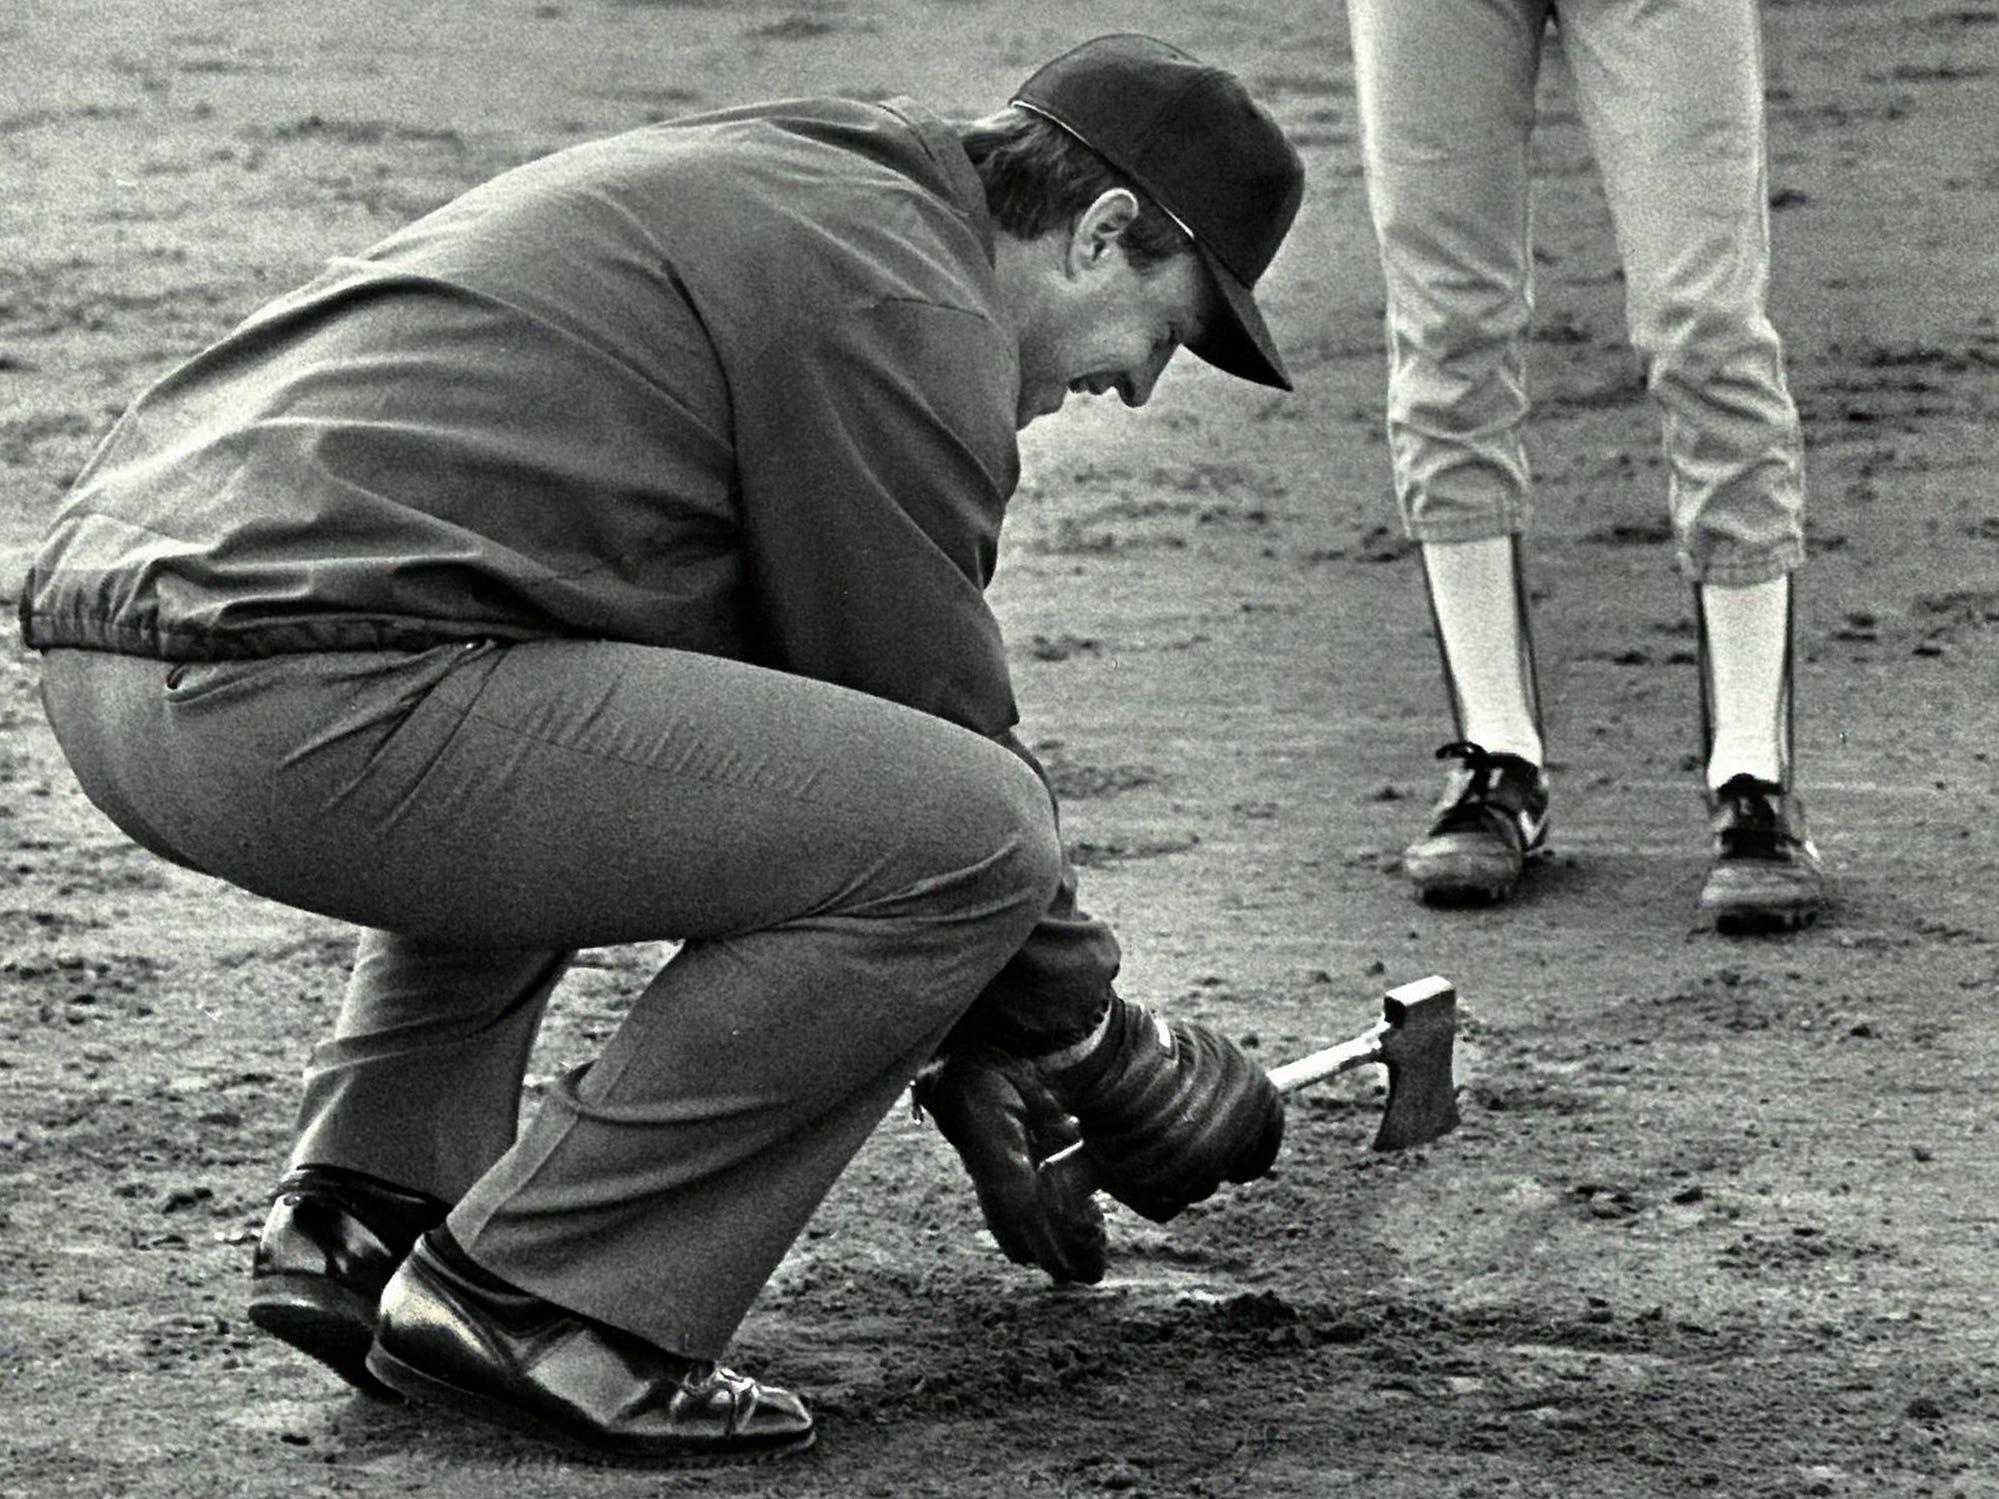 03/29/88Ump Jim Rye Removes Rock